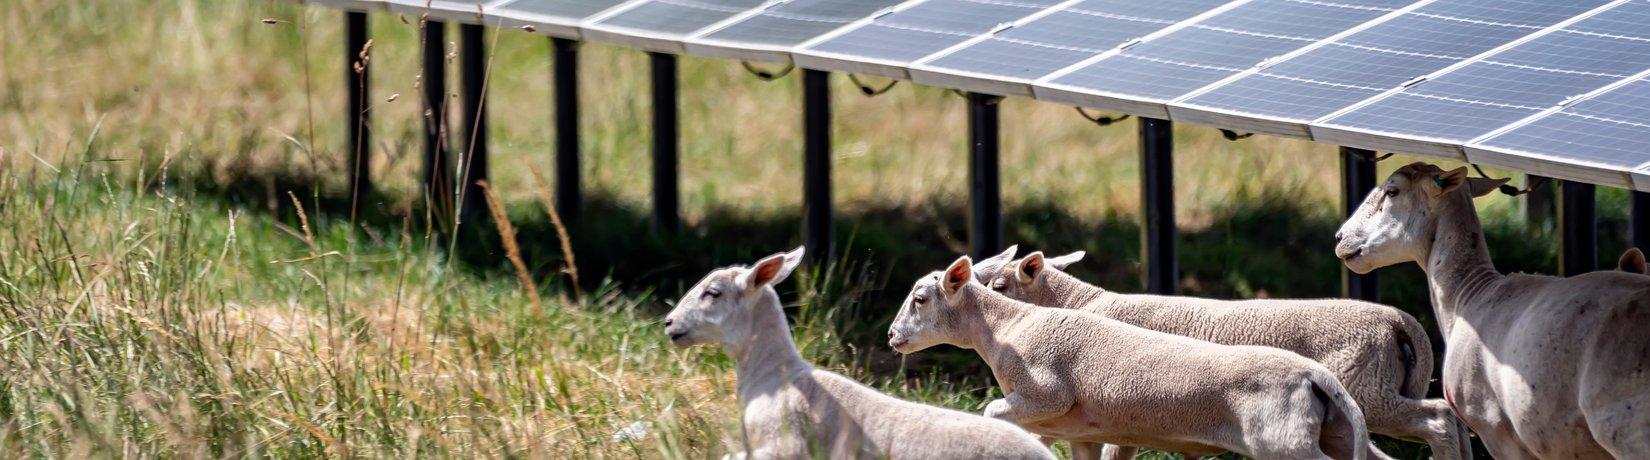 Header Fakten Photovoltaik Solarzellen